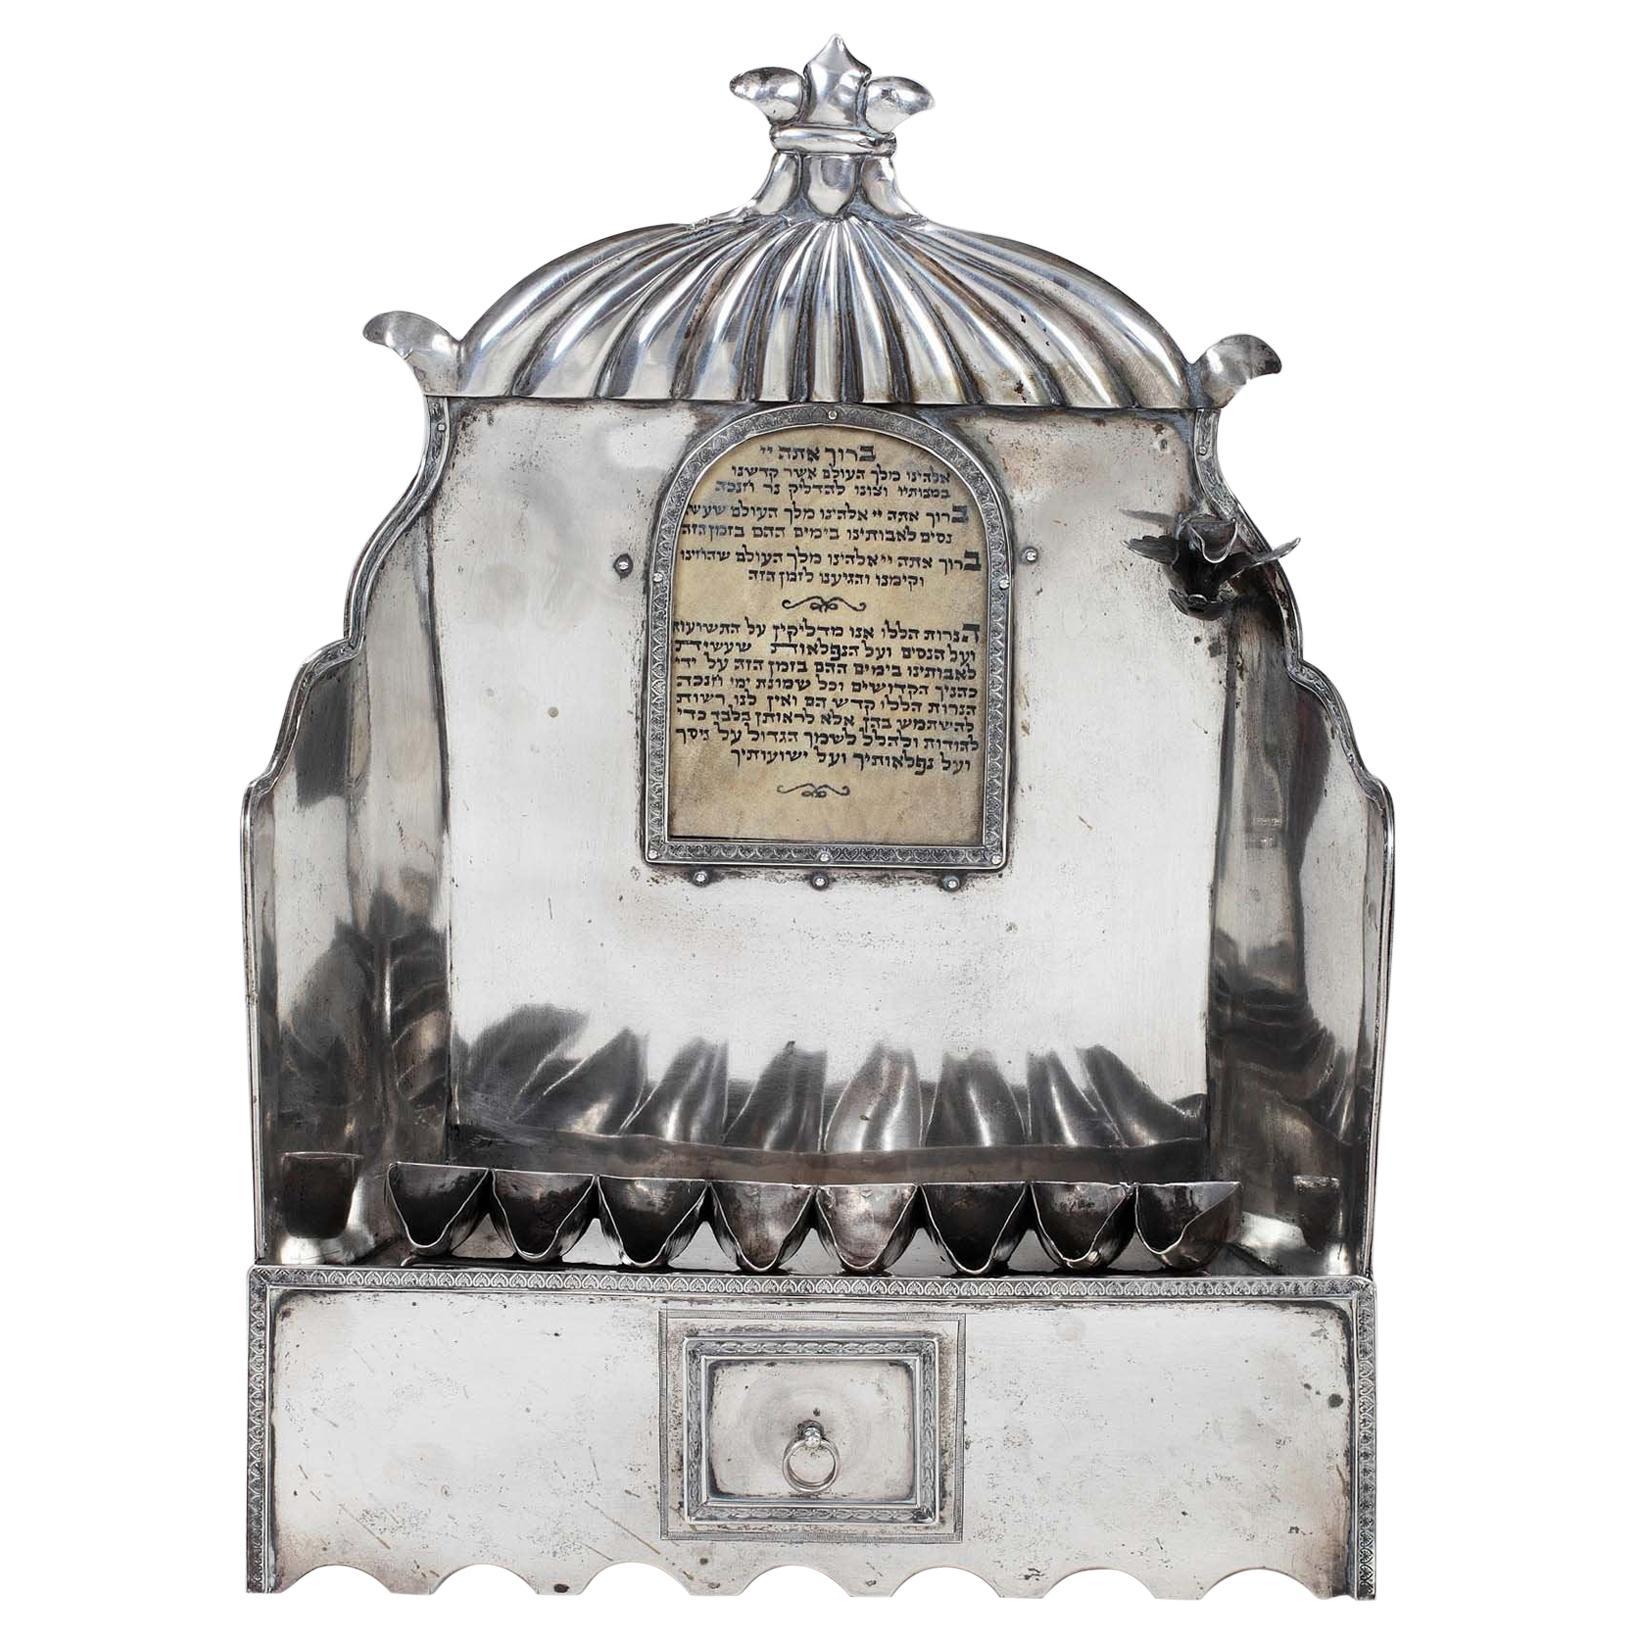 Early 19th Century French Silver Hanukkah Lamp Menorah